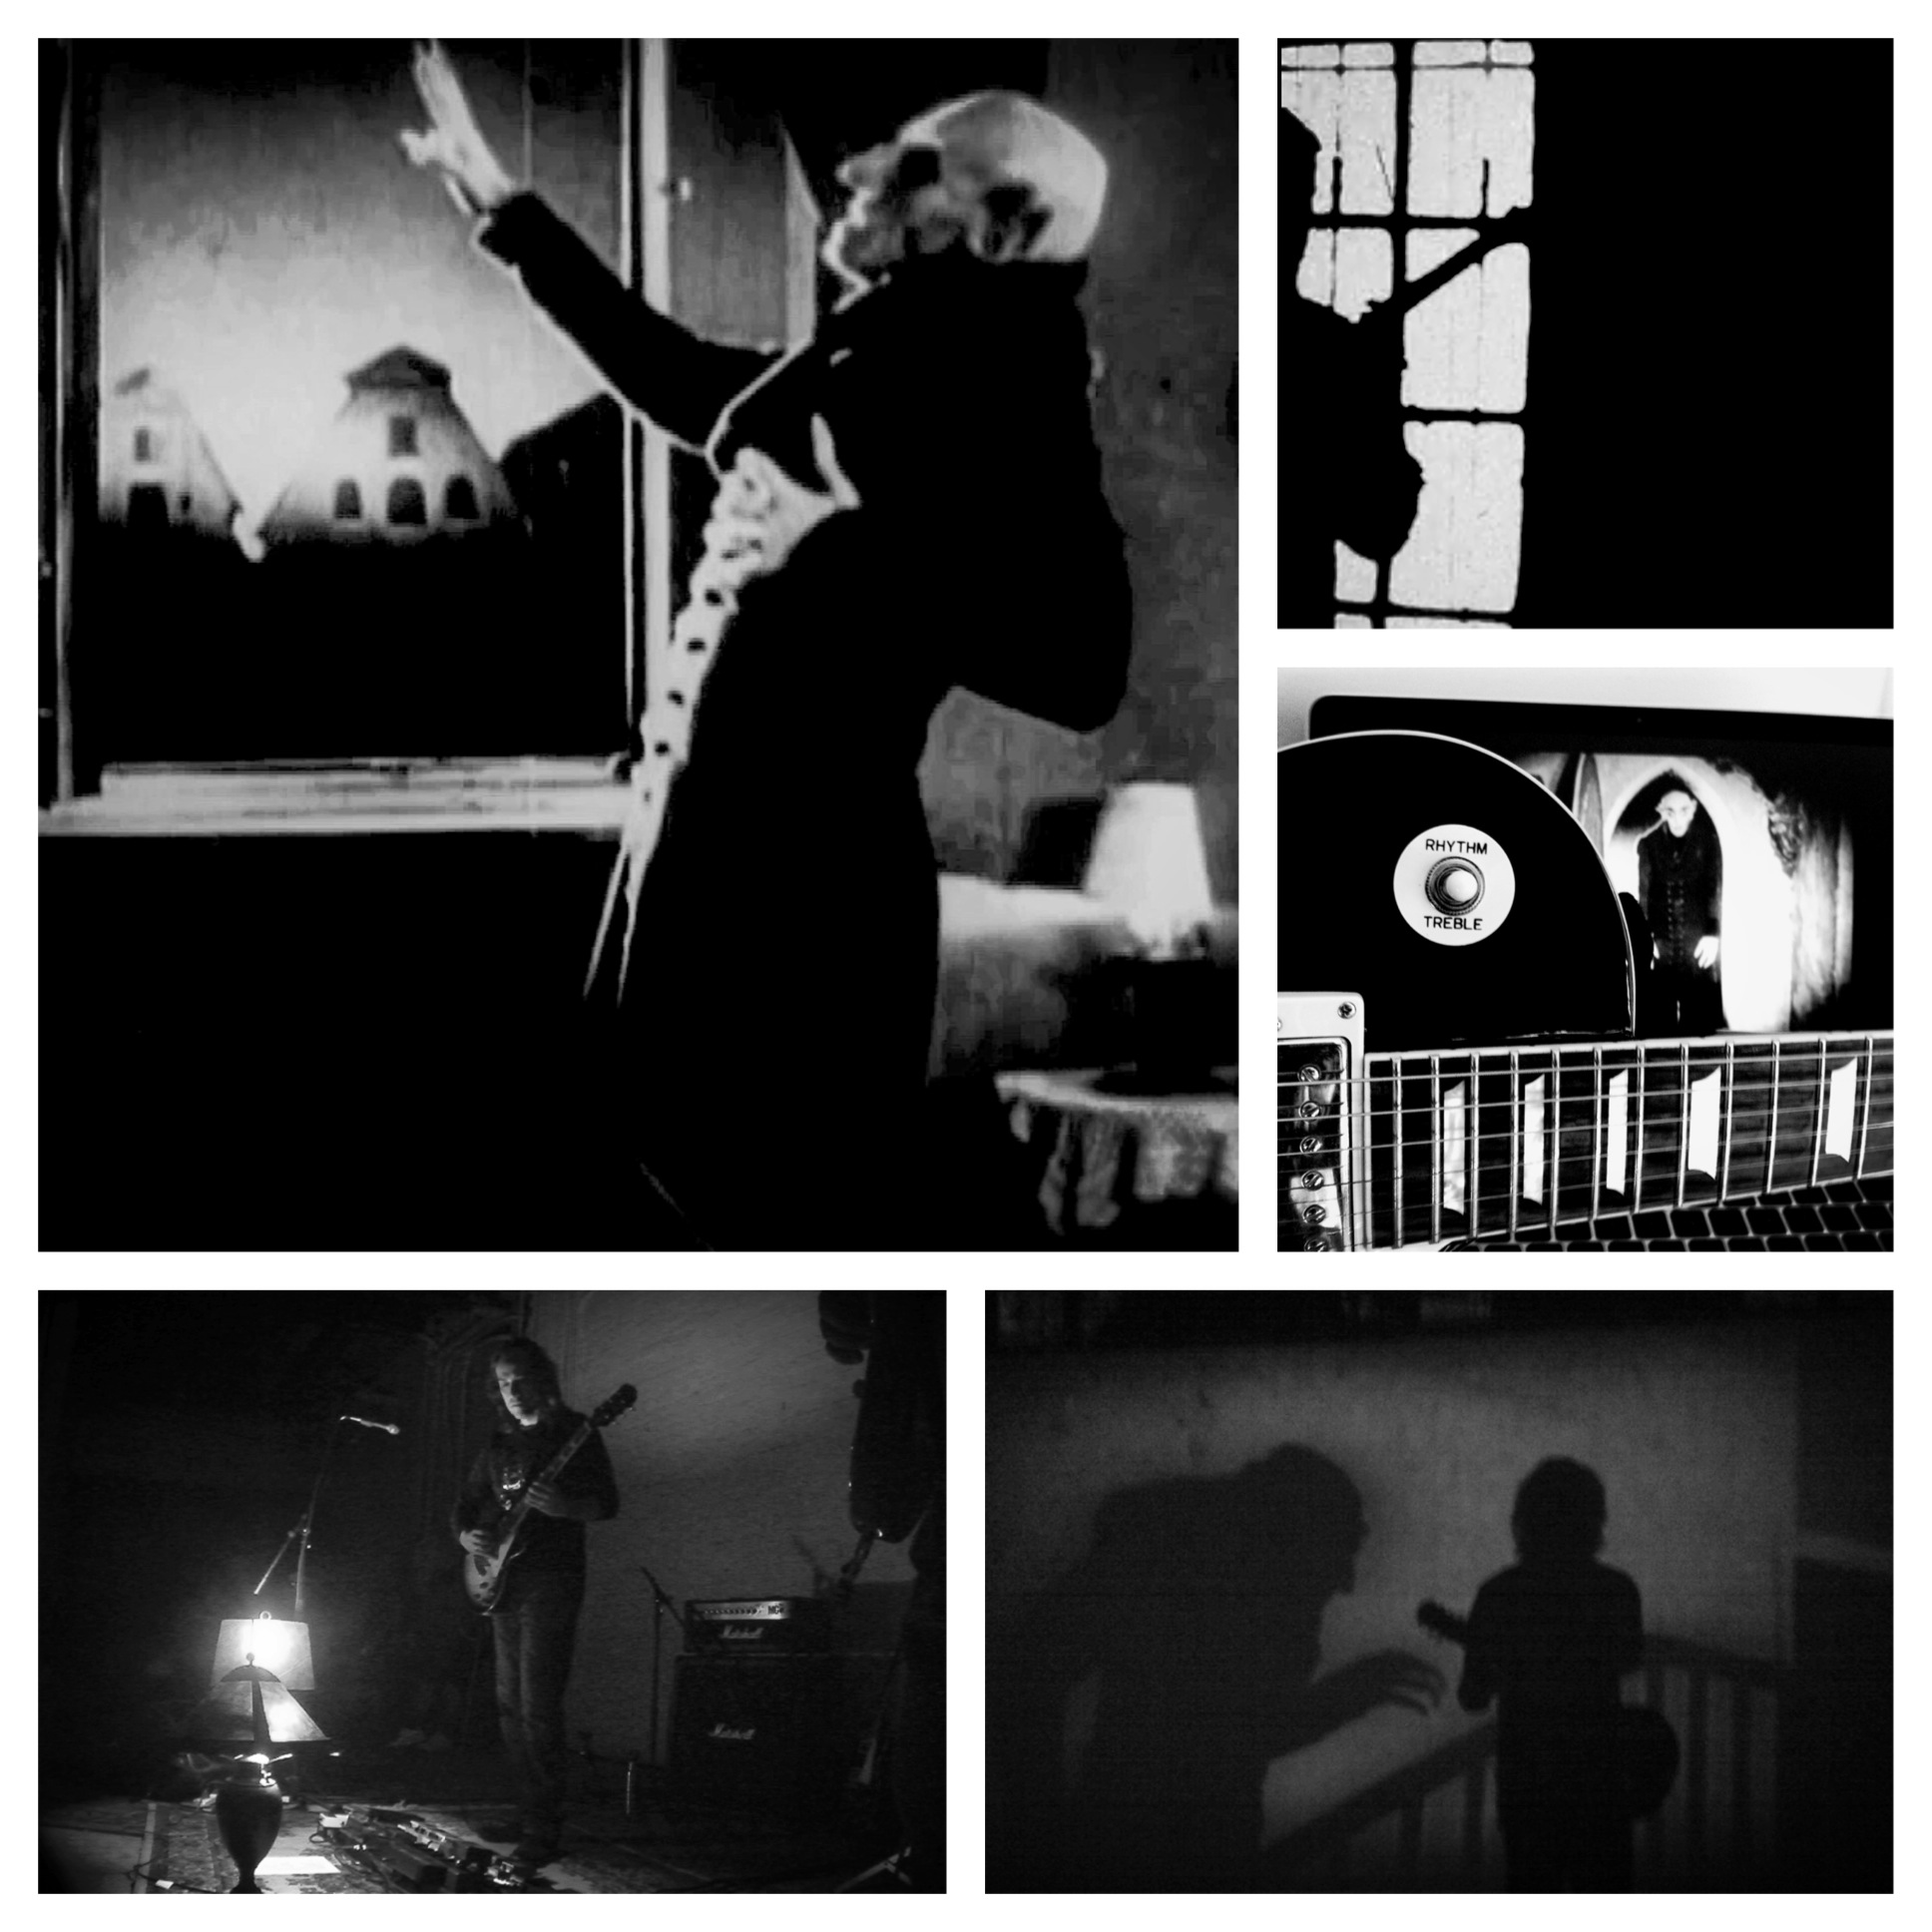 Nosferatu Promo Photo 5